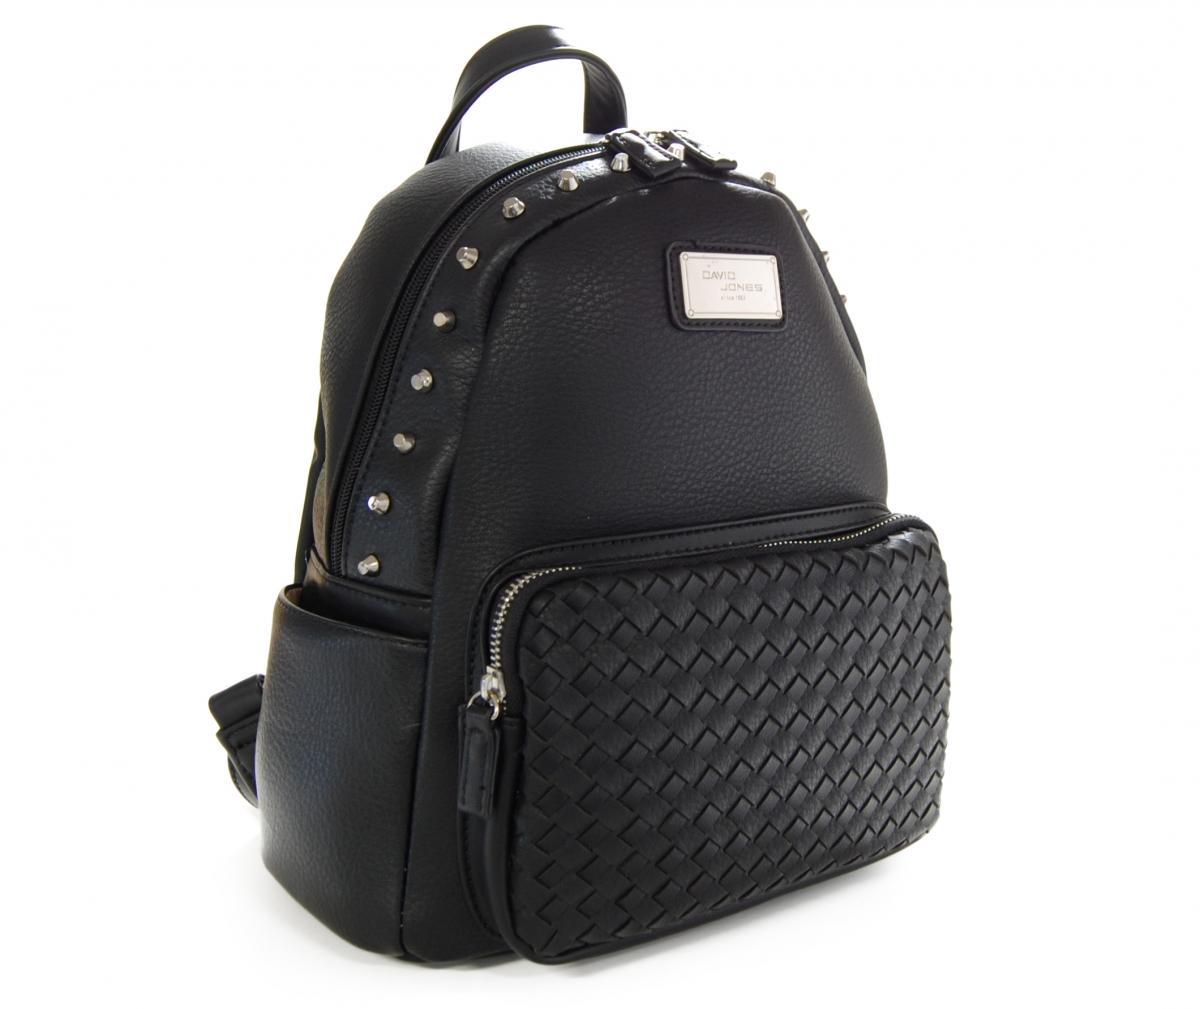 Módní batoh David Jones J17 CM 3525-020, černý CM 3525-020